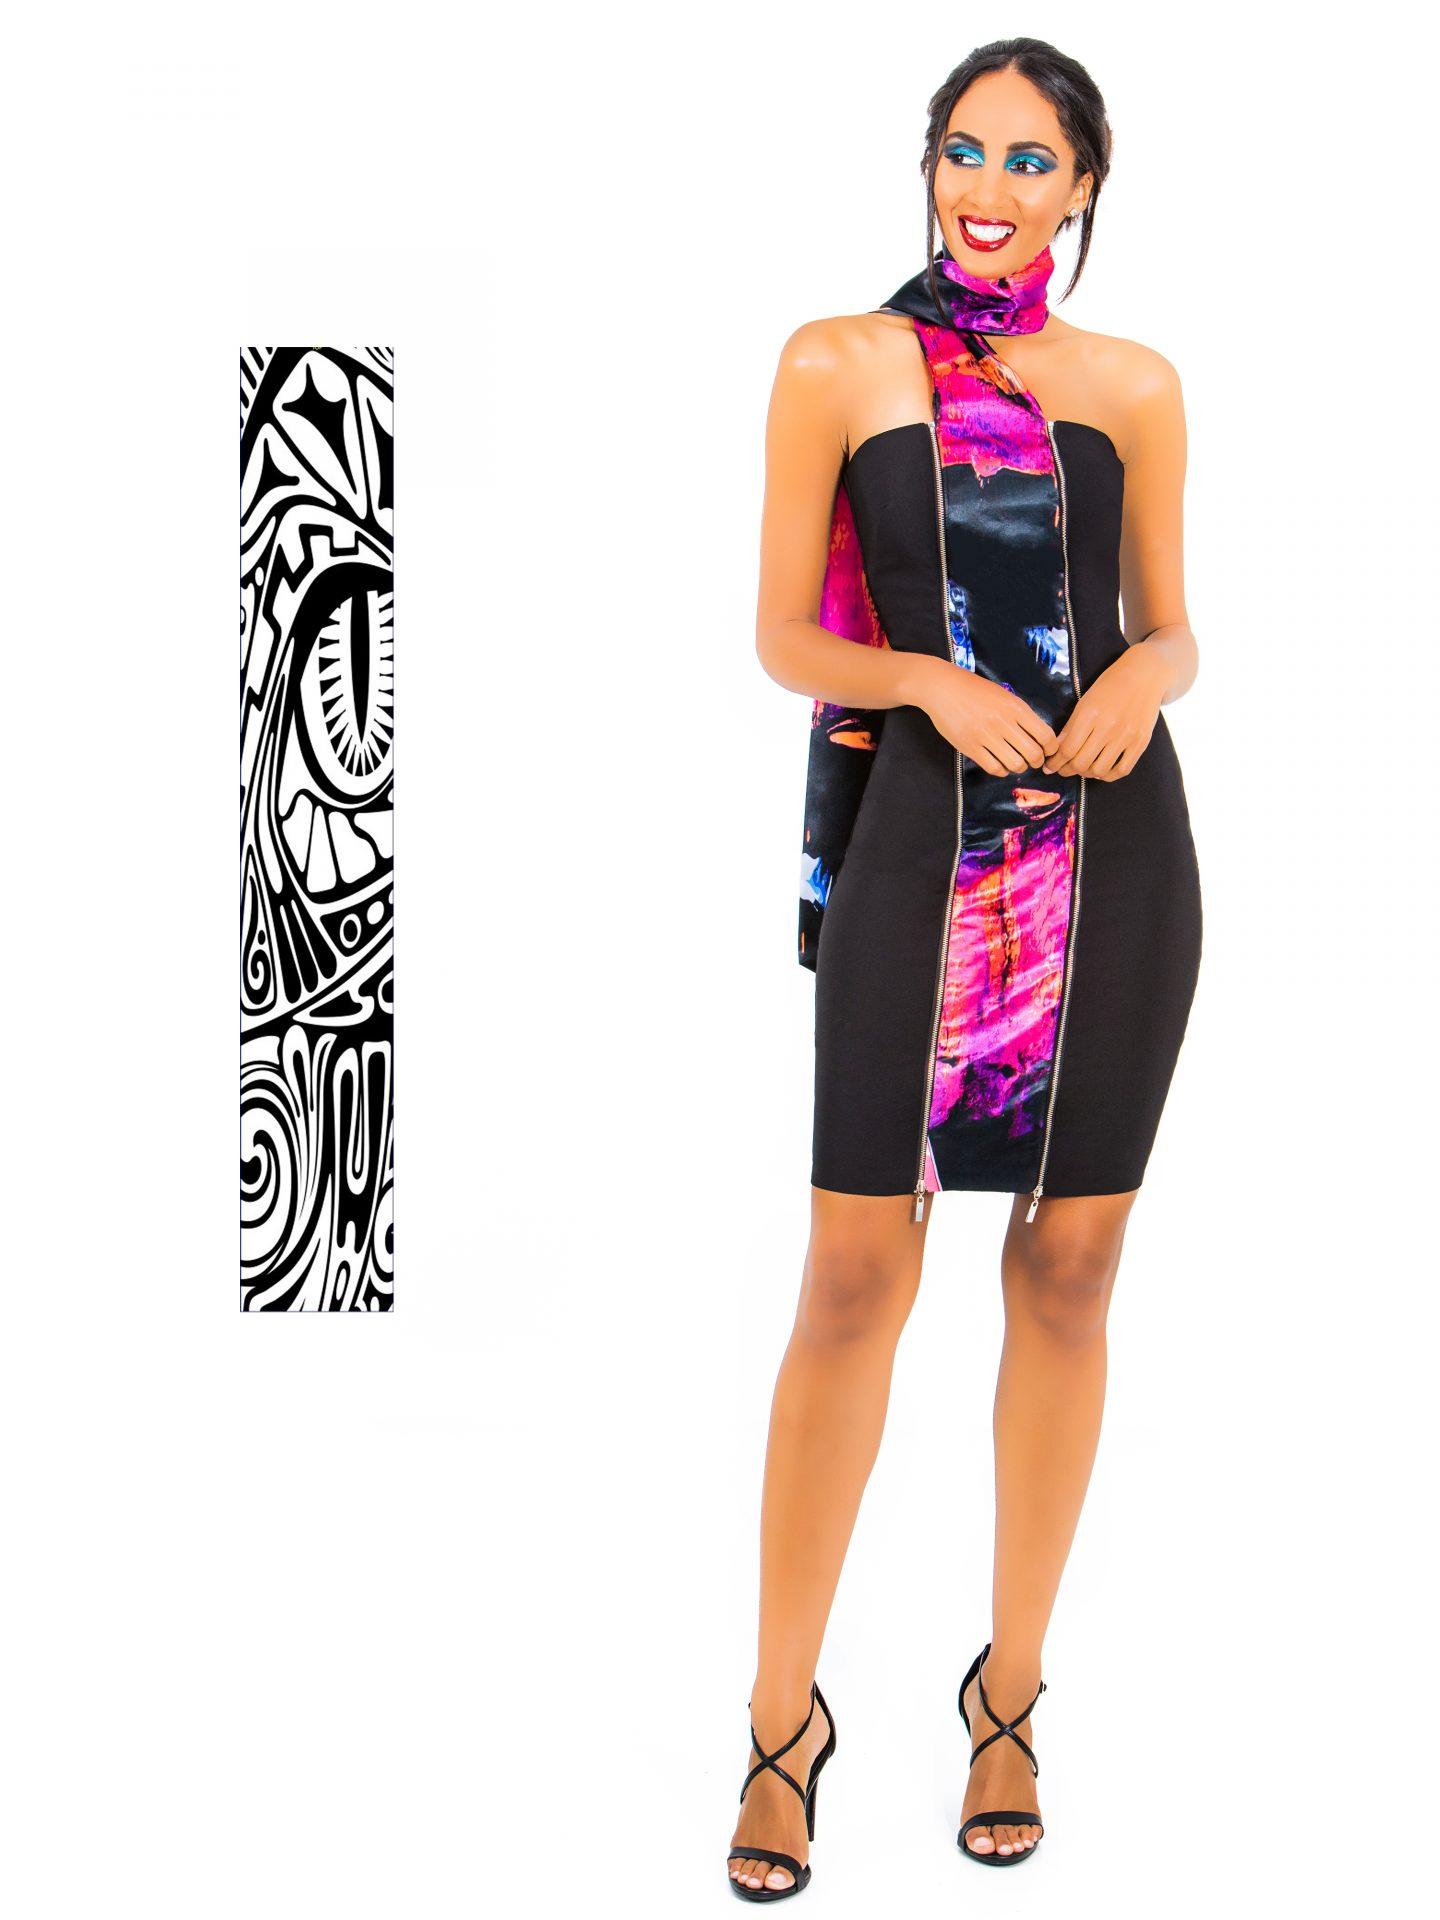 Zyana dress colorset 3